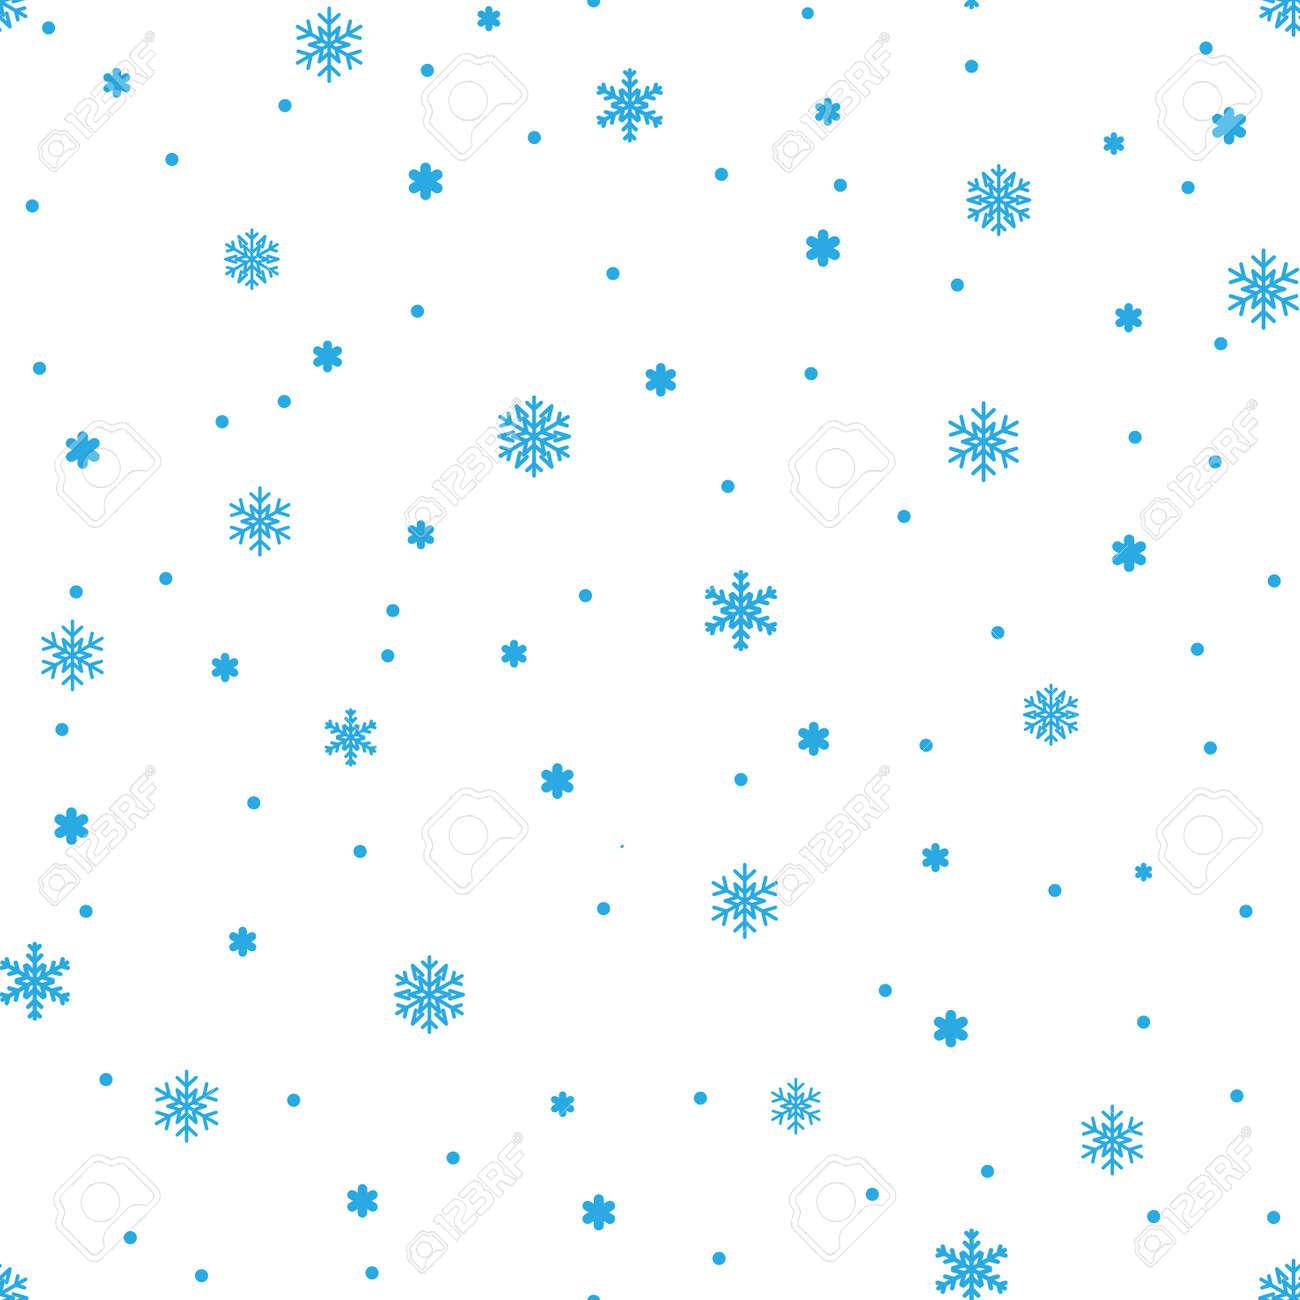 Snowflake Simple Seamless Pattern Blue Snow On White Background